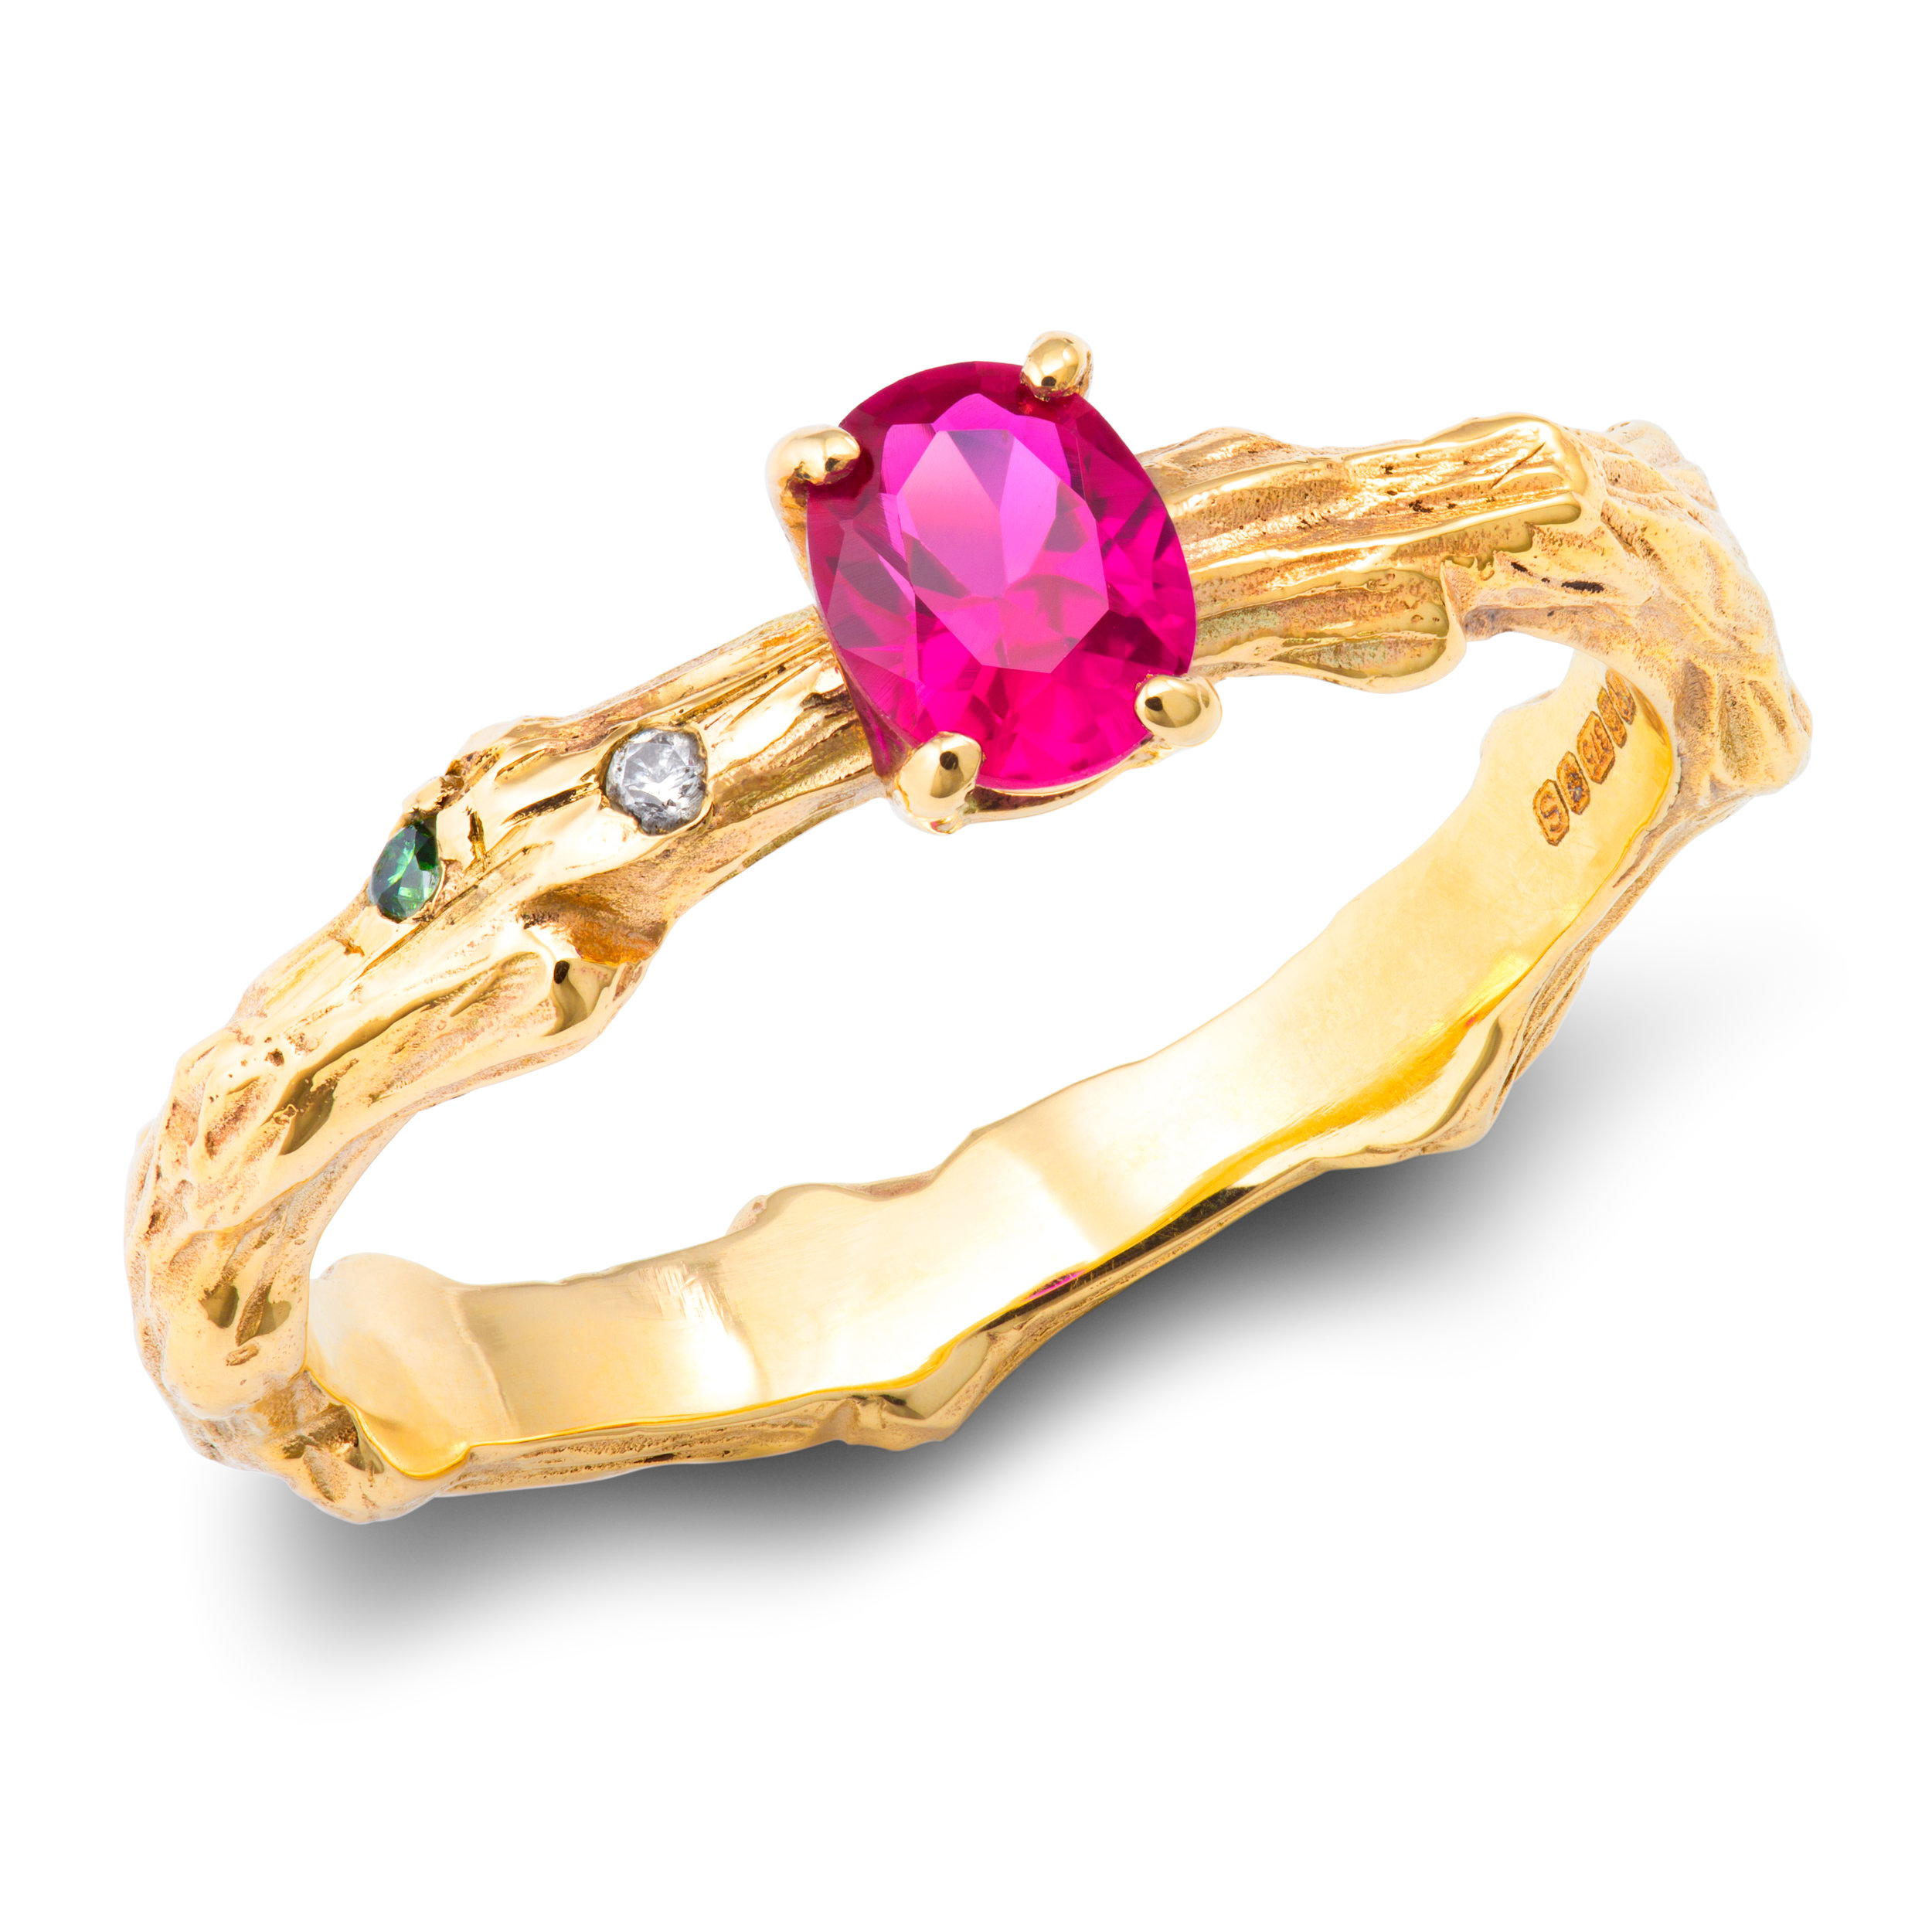 9ct yellow gold, lab-created ruby & diamond ring - £545